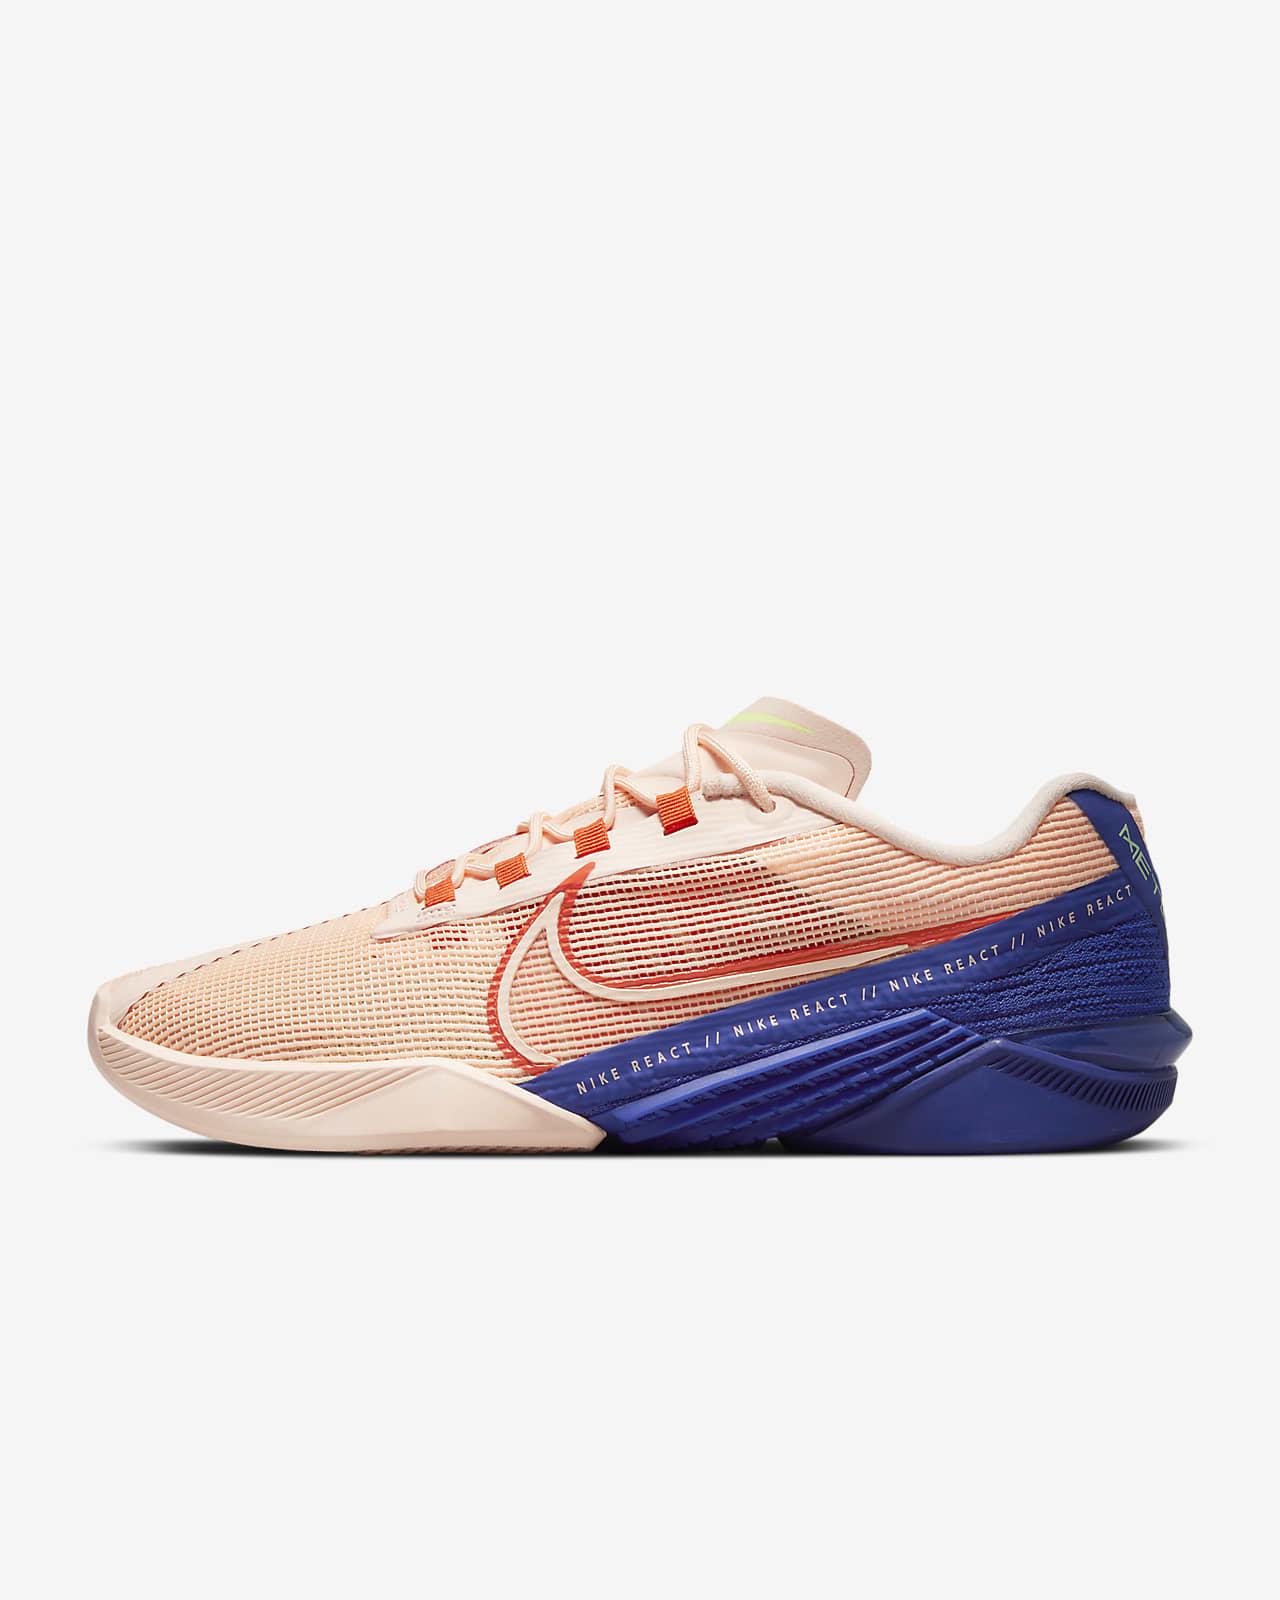 Chaussure de training Nike React Metcon Turbo pour Femme